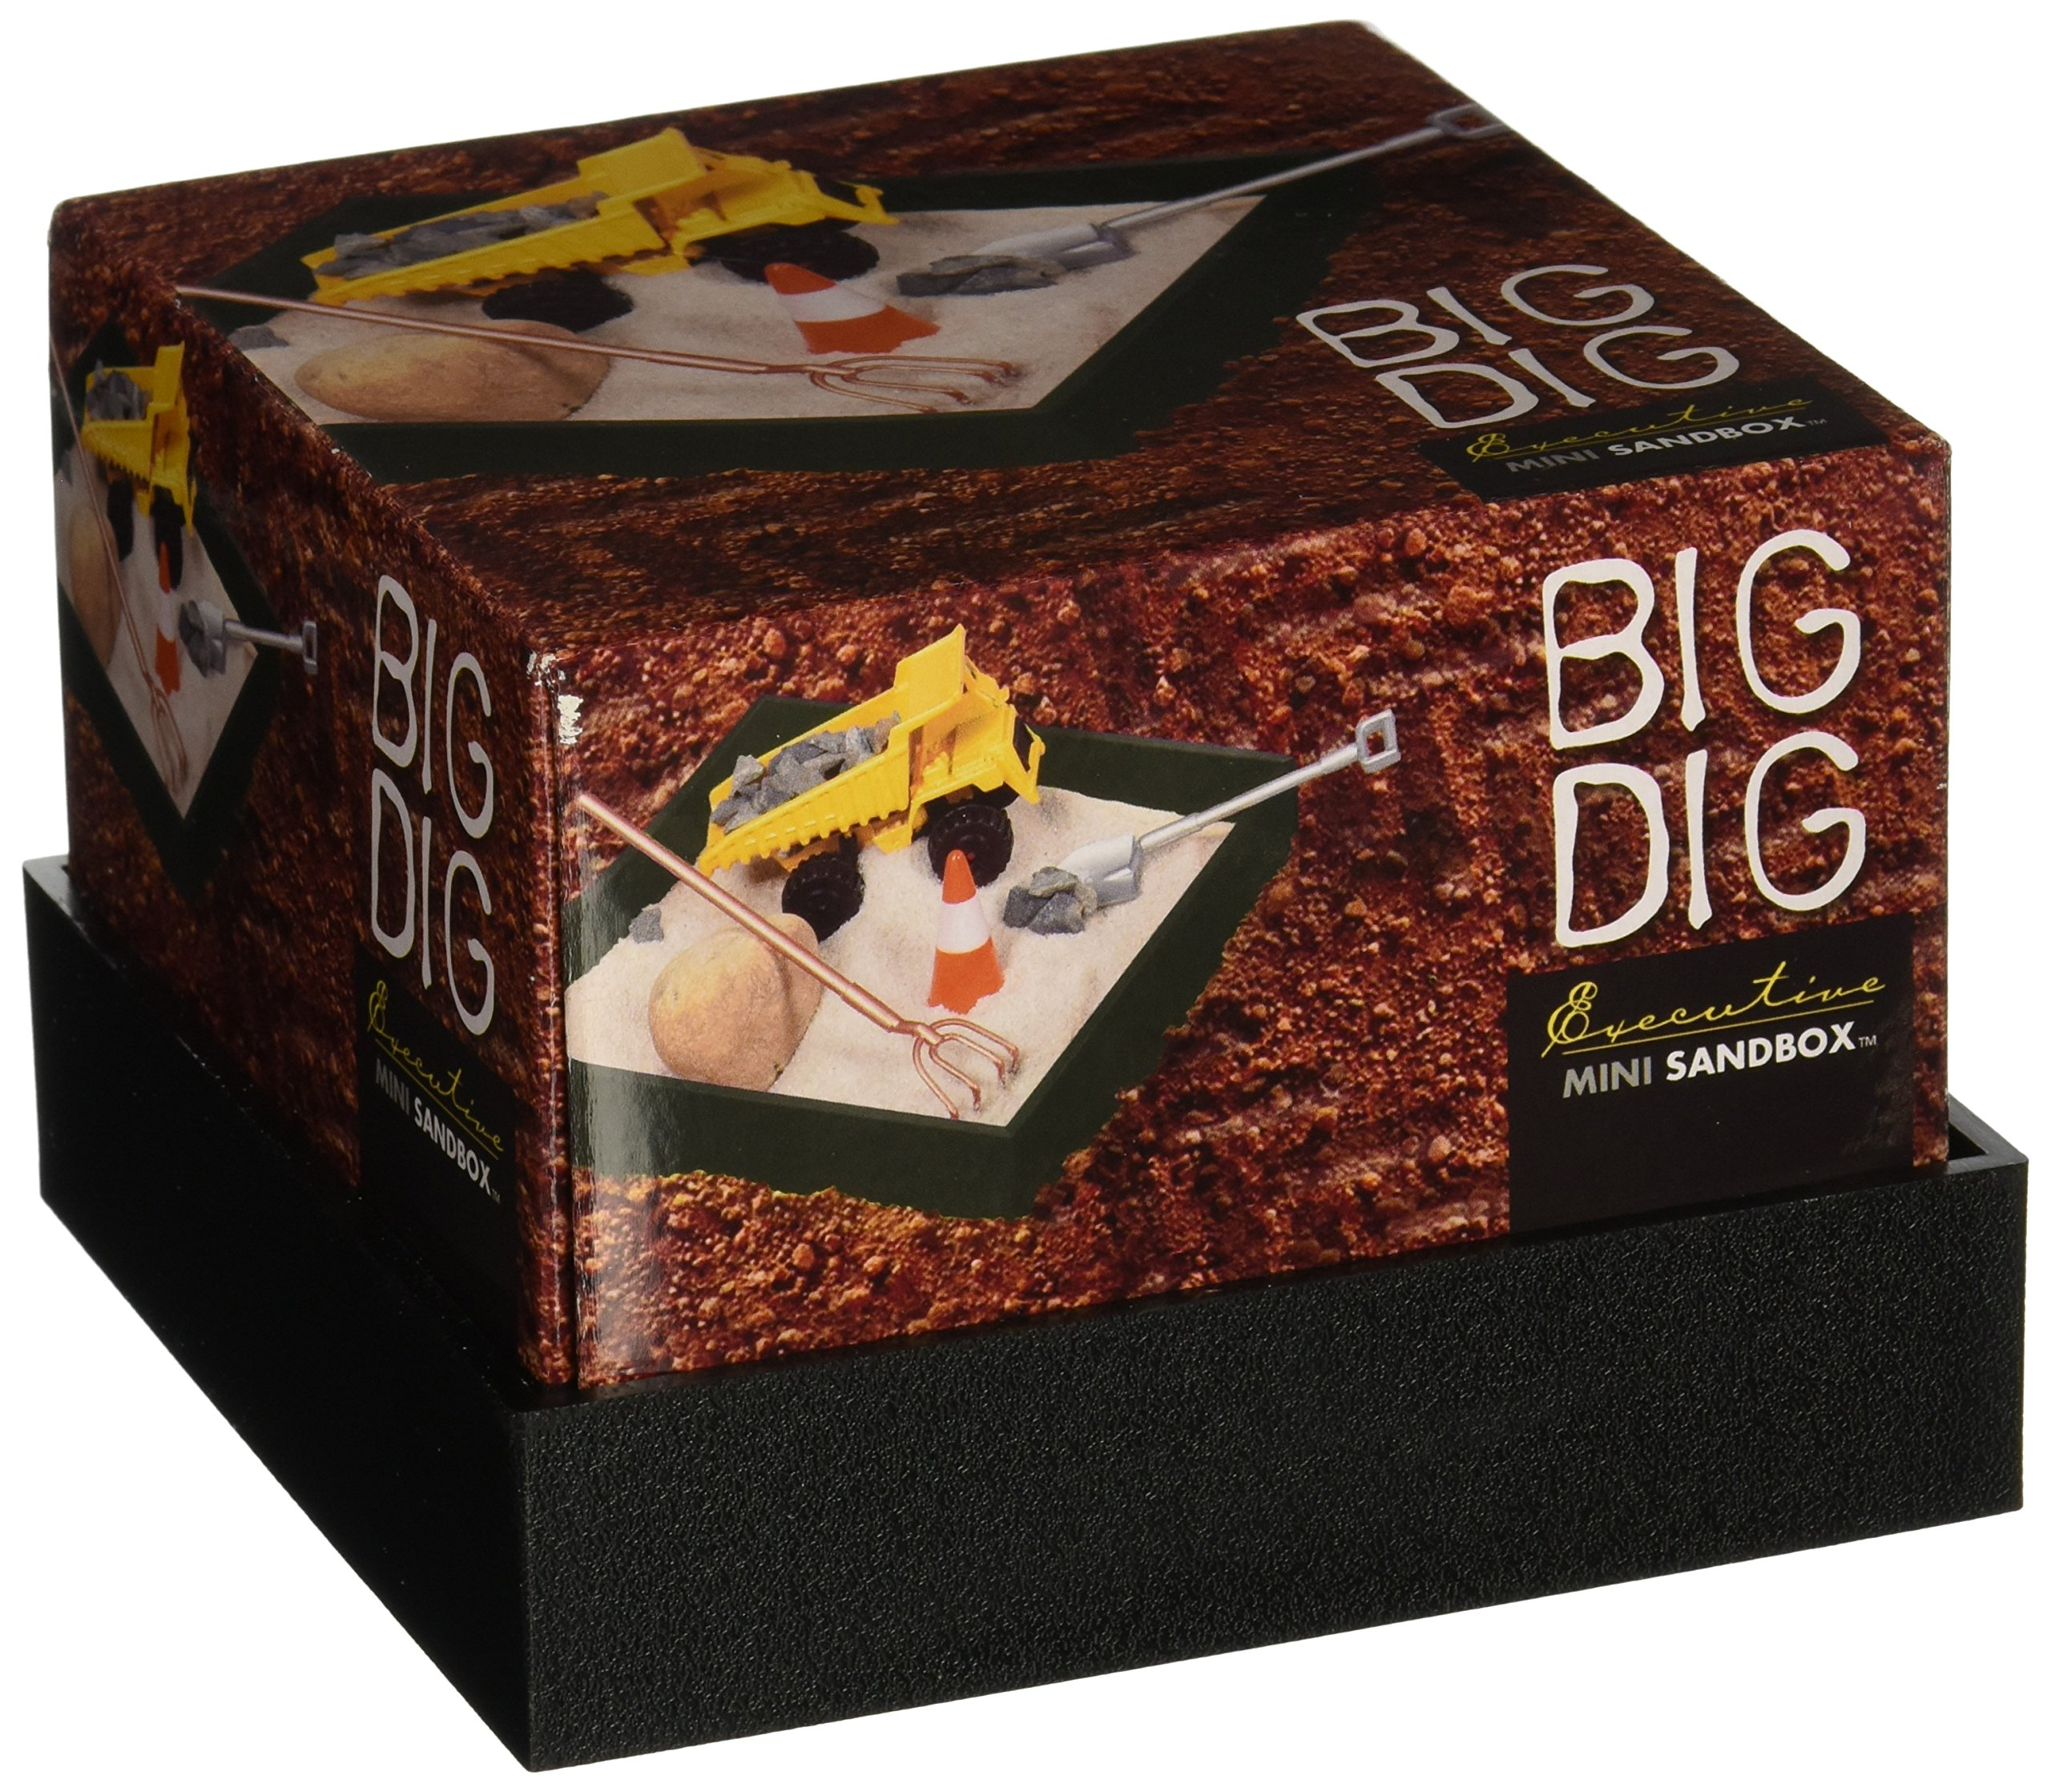 Executive Mini-Sandbox - Big Dig